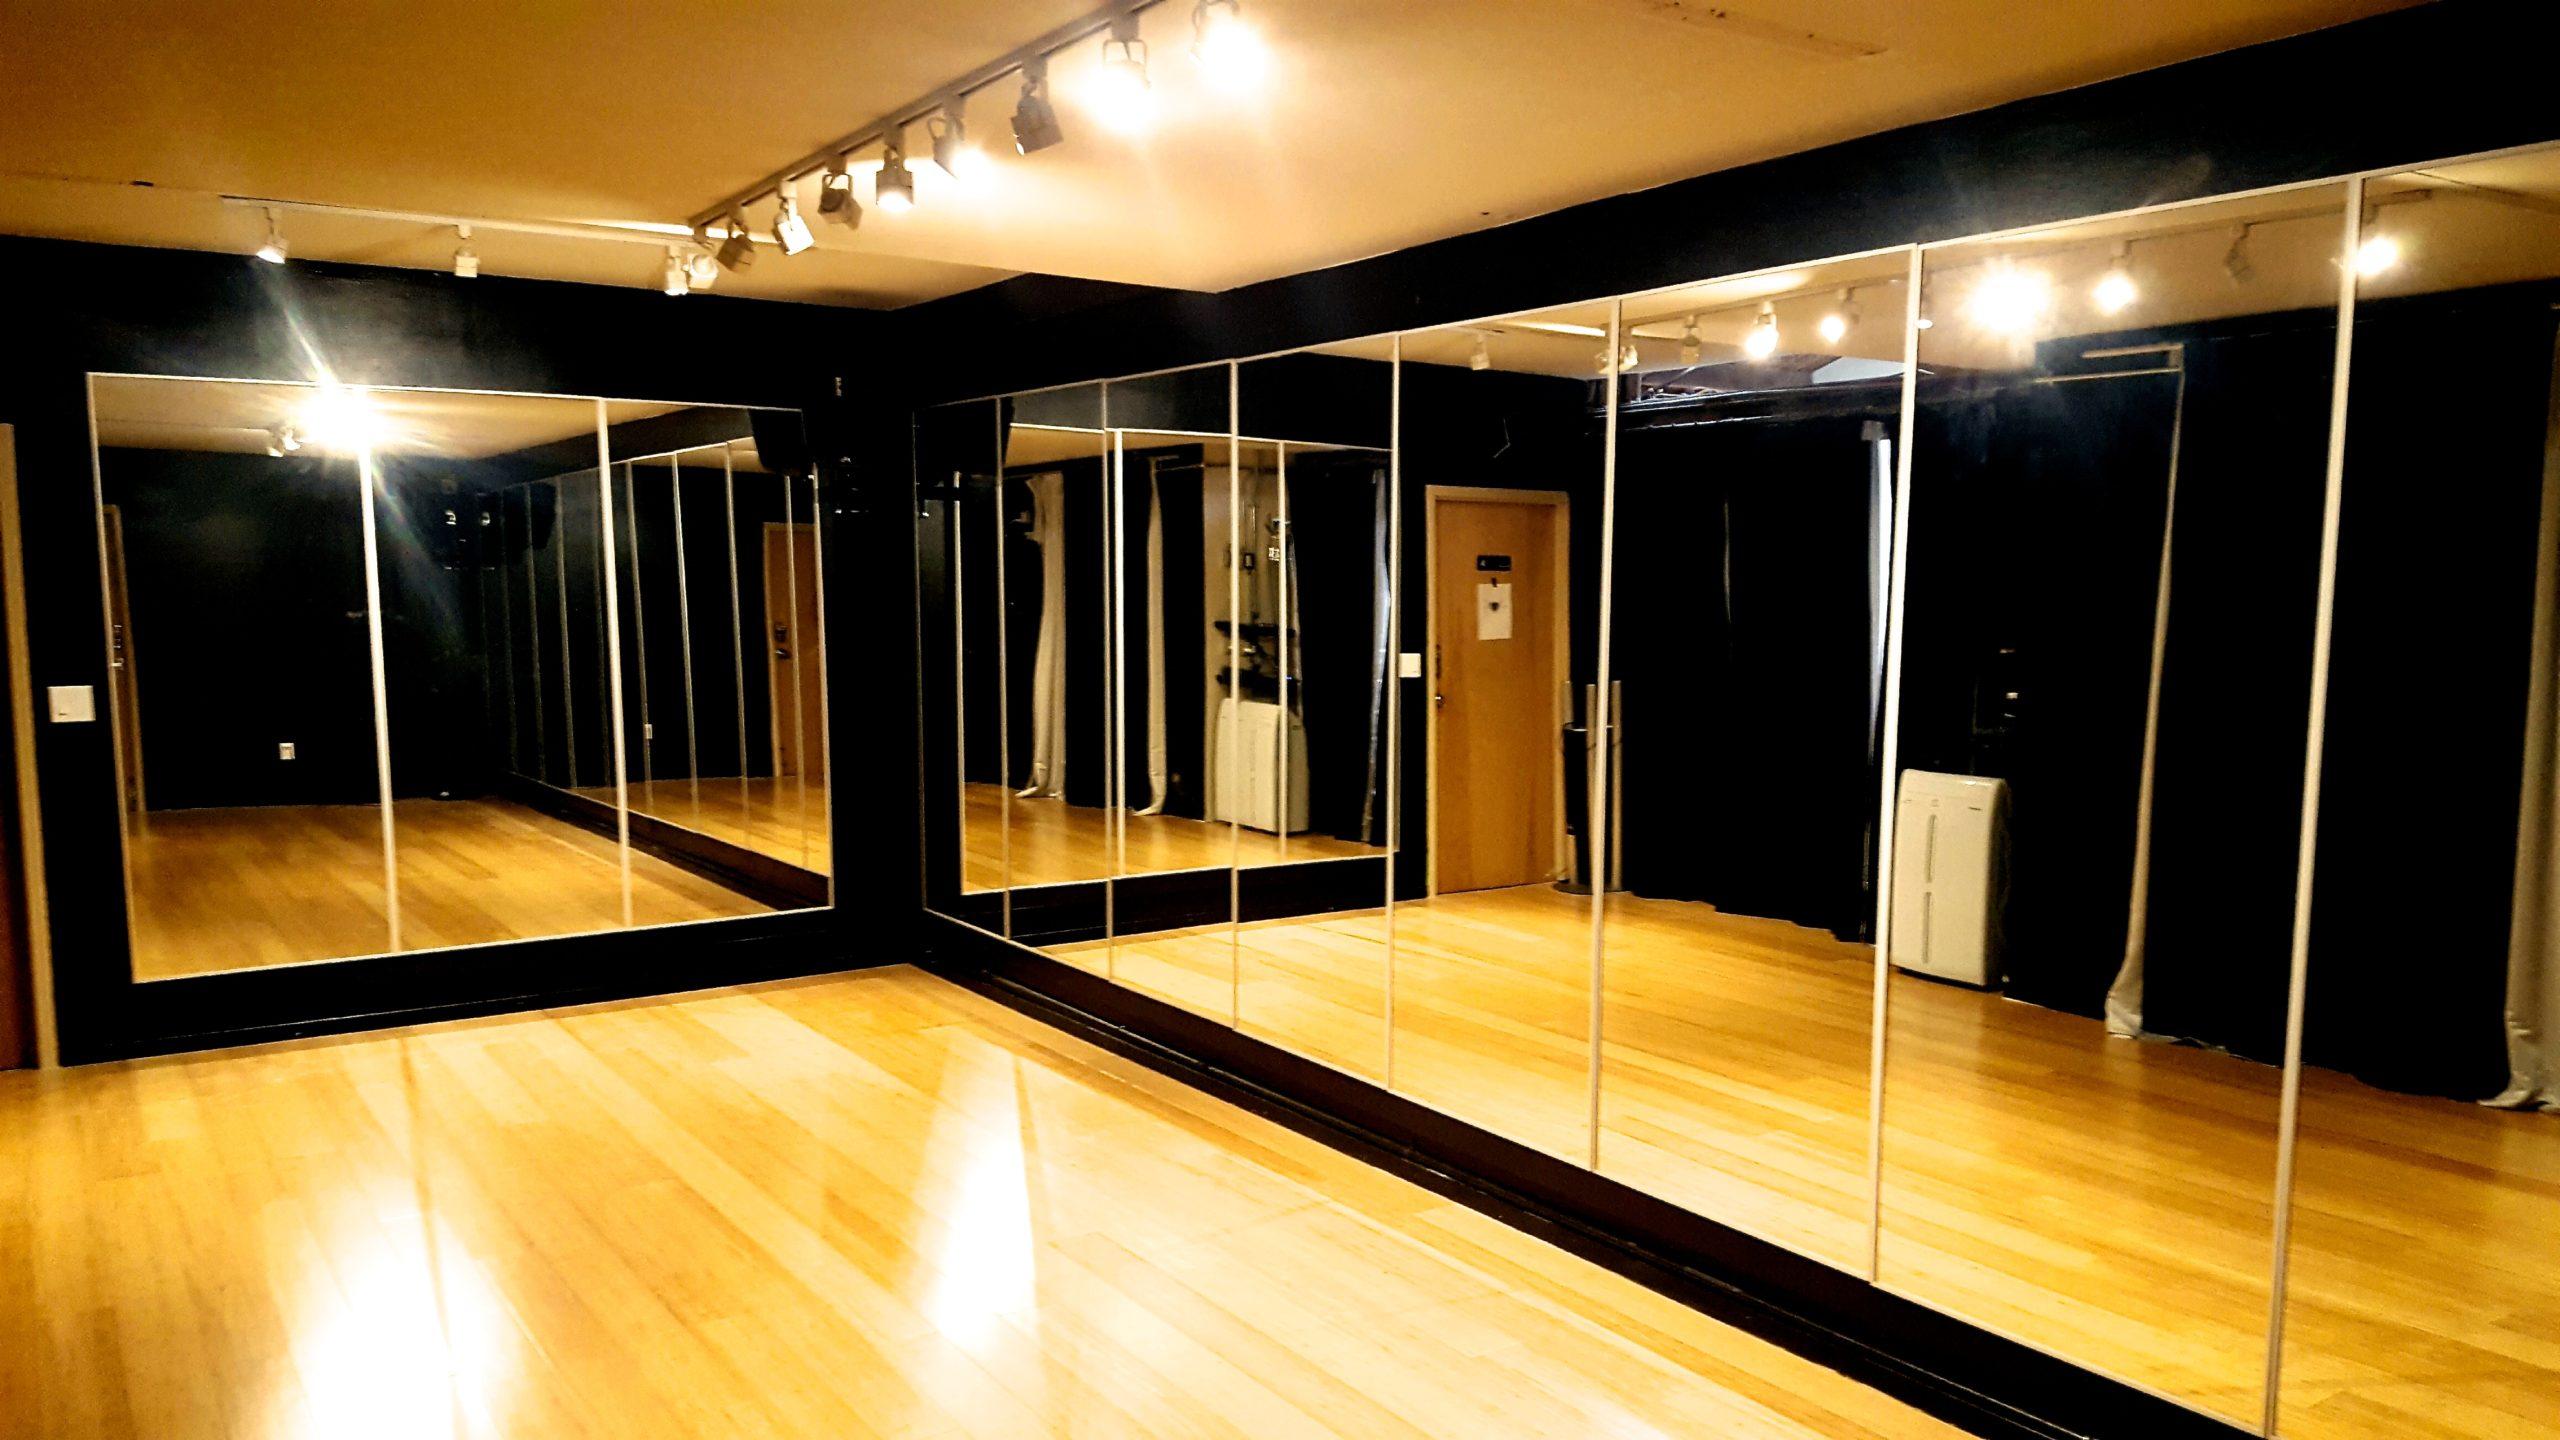 Trilliant Studios Dance Studio in Oakland California